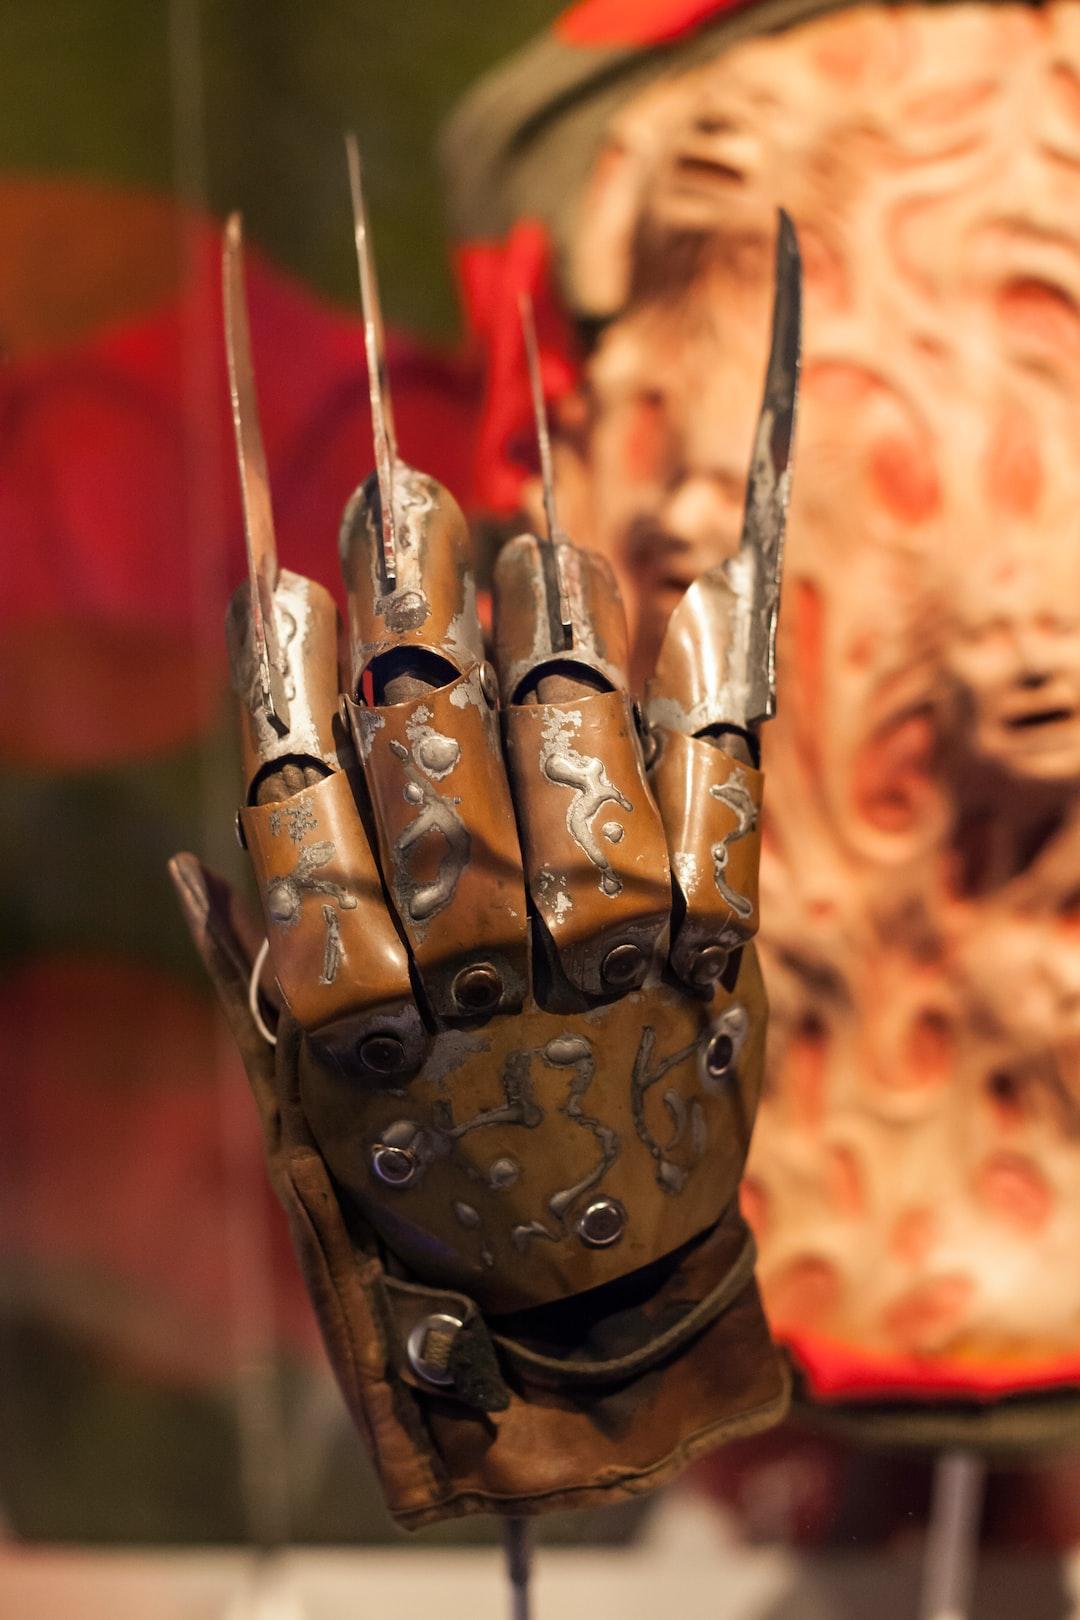 Freddy's nightmarish glove